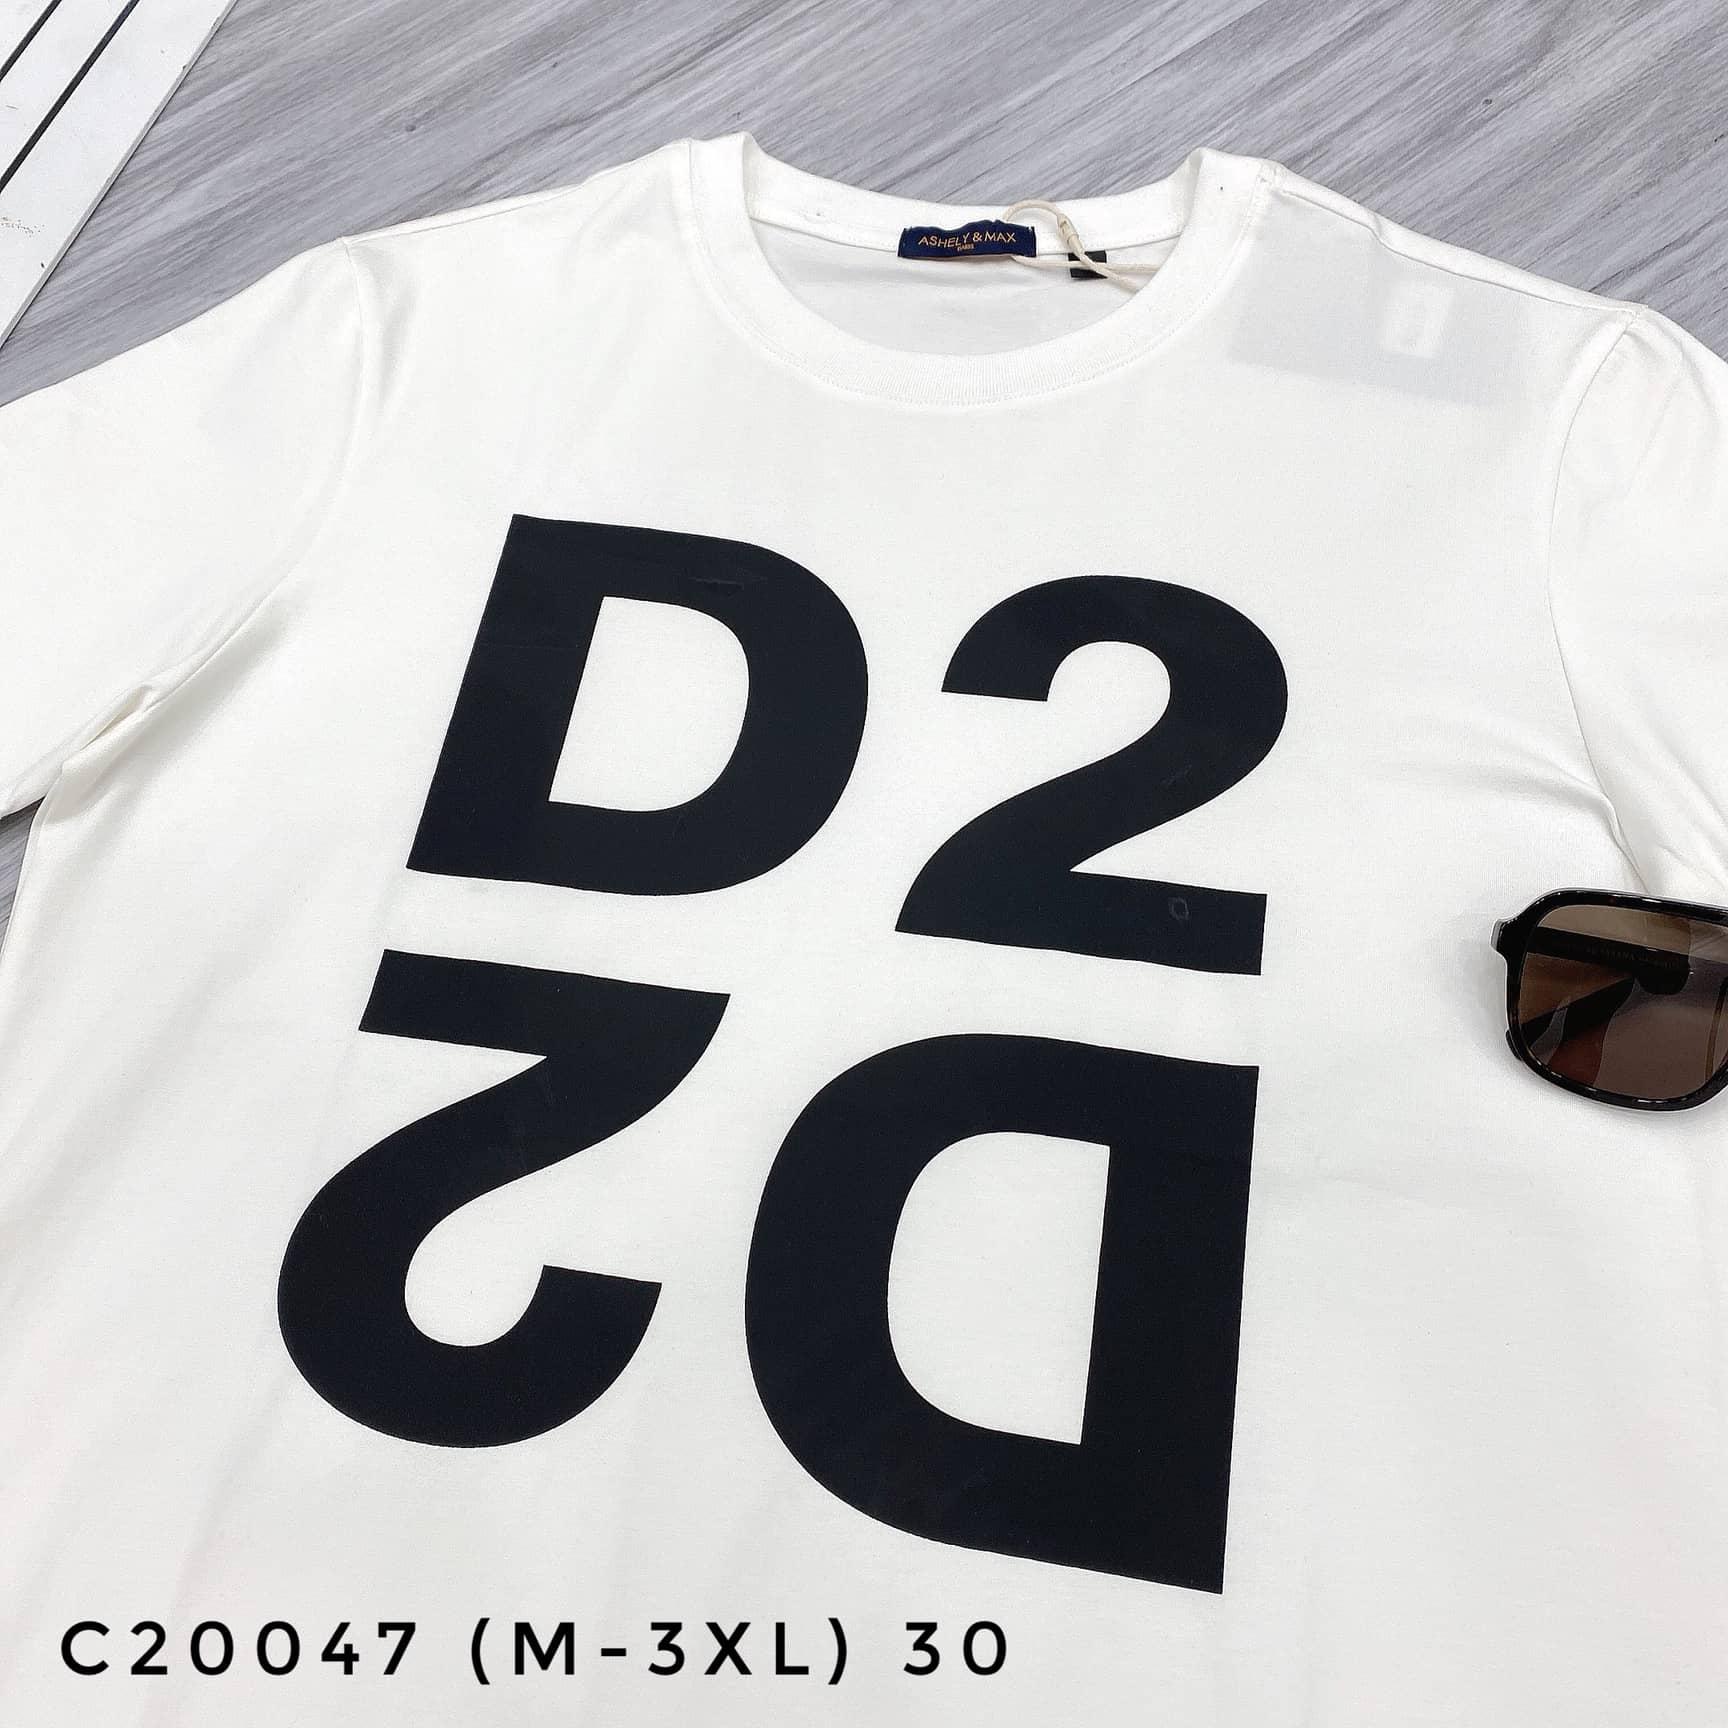 AT CỔ TRÒN C20047 (M-3XL)